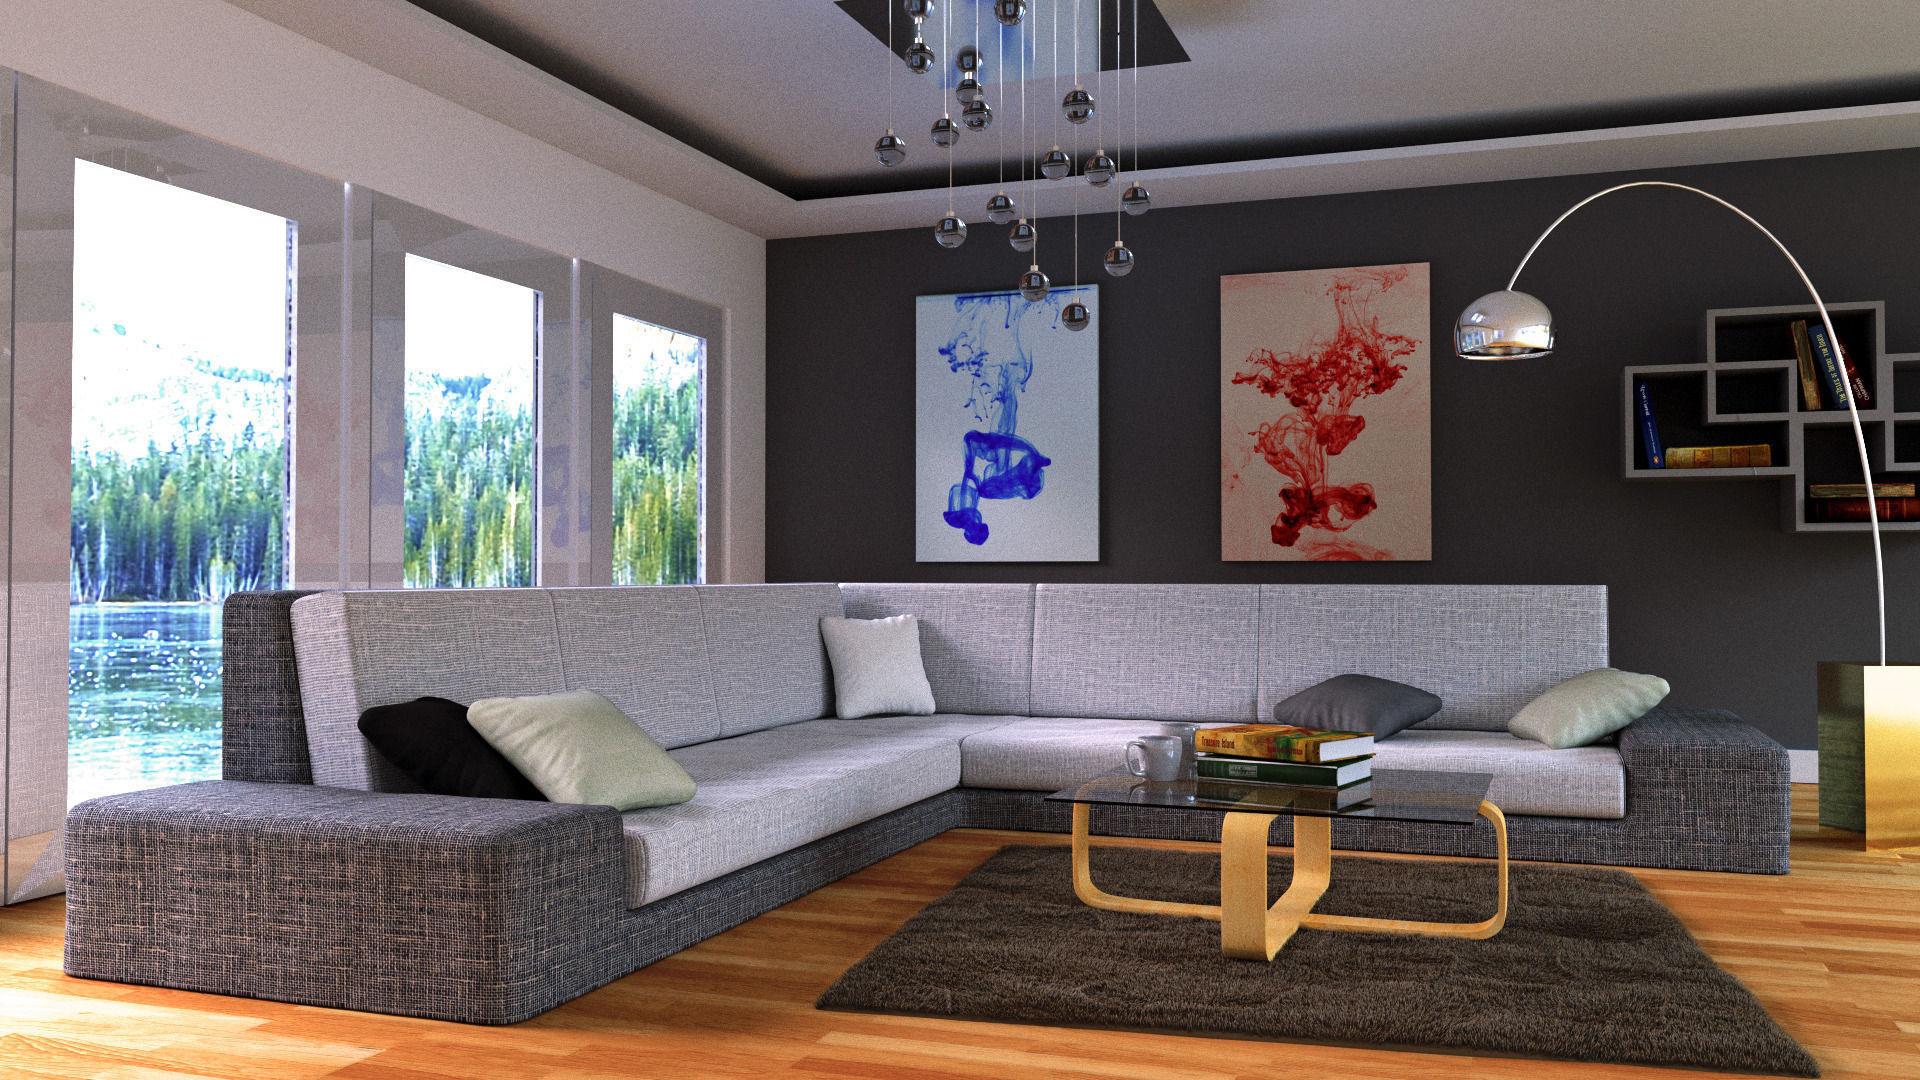 Lounge Room day and night scene blender models